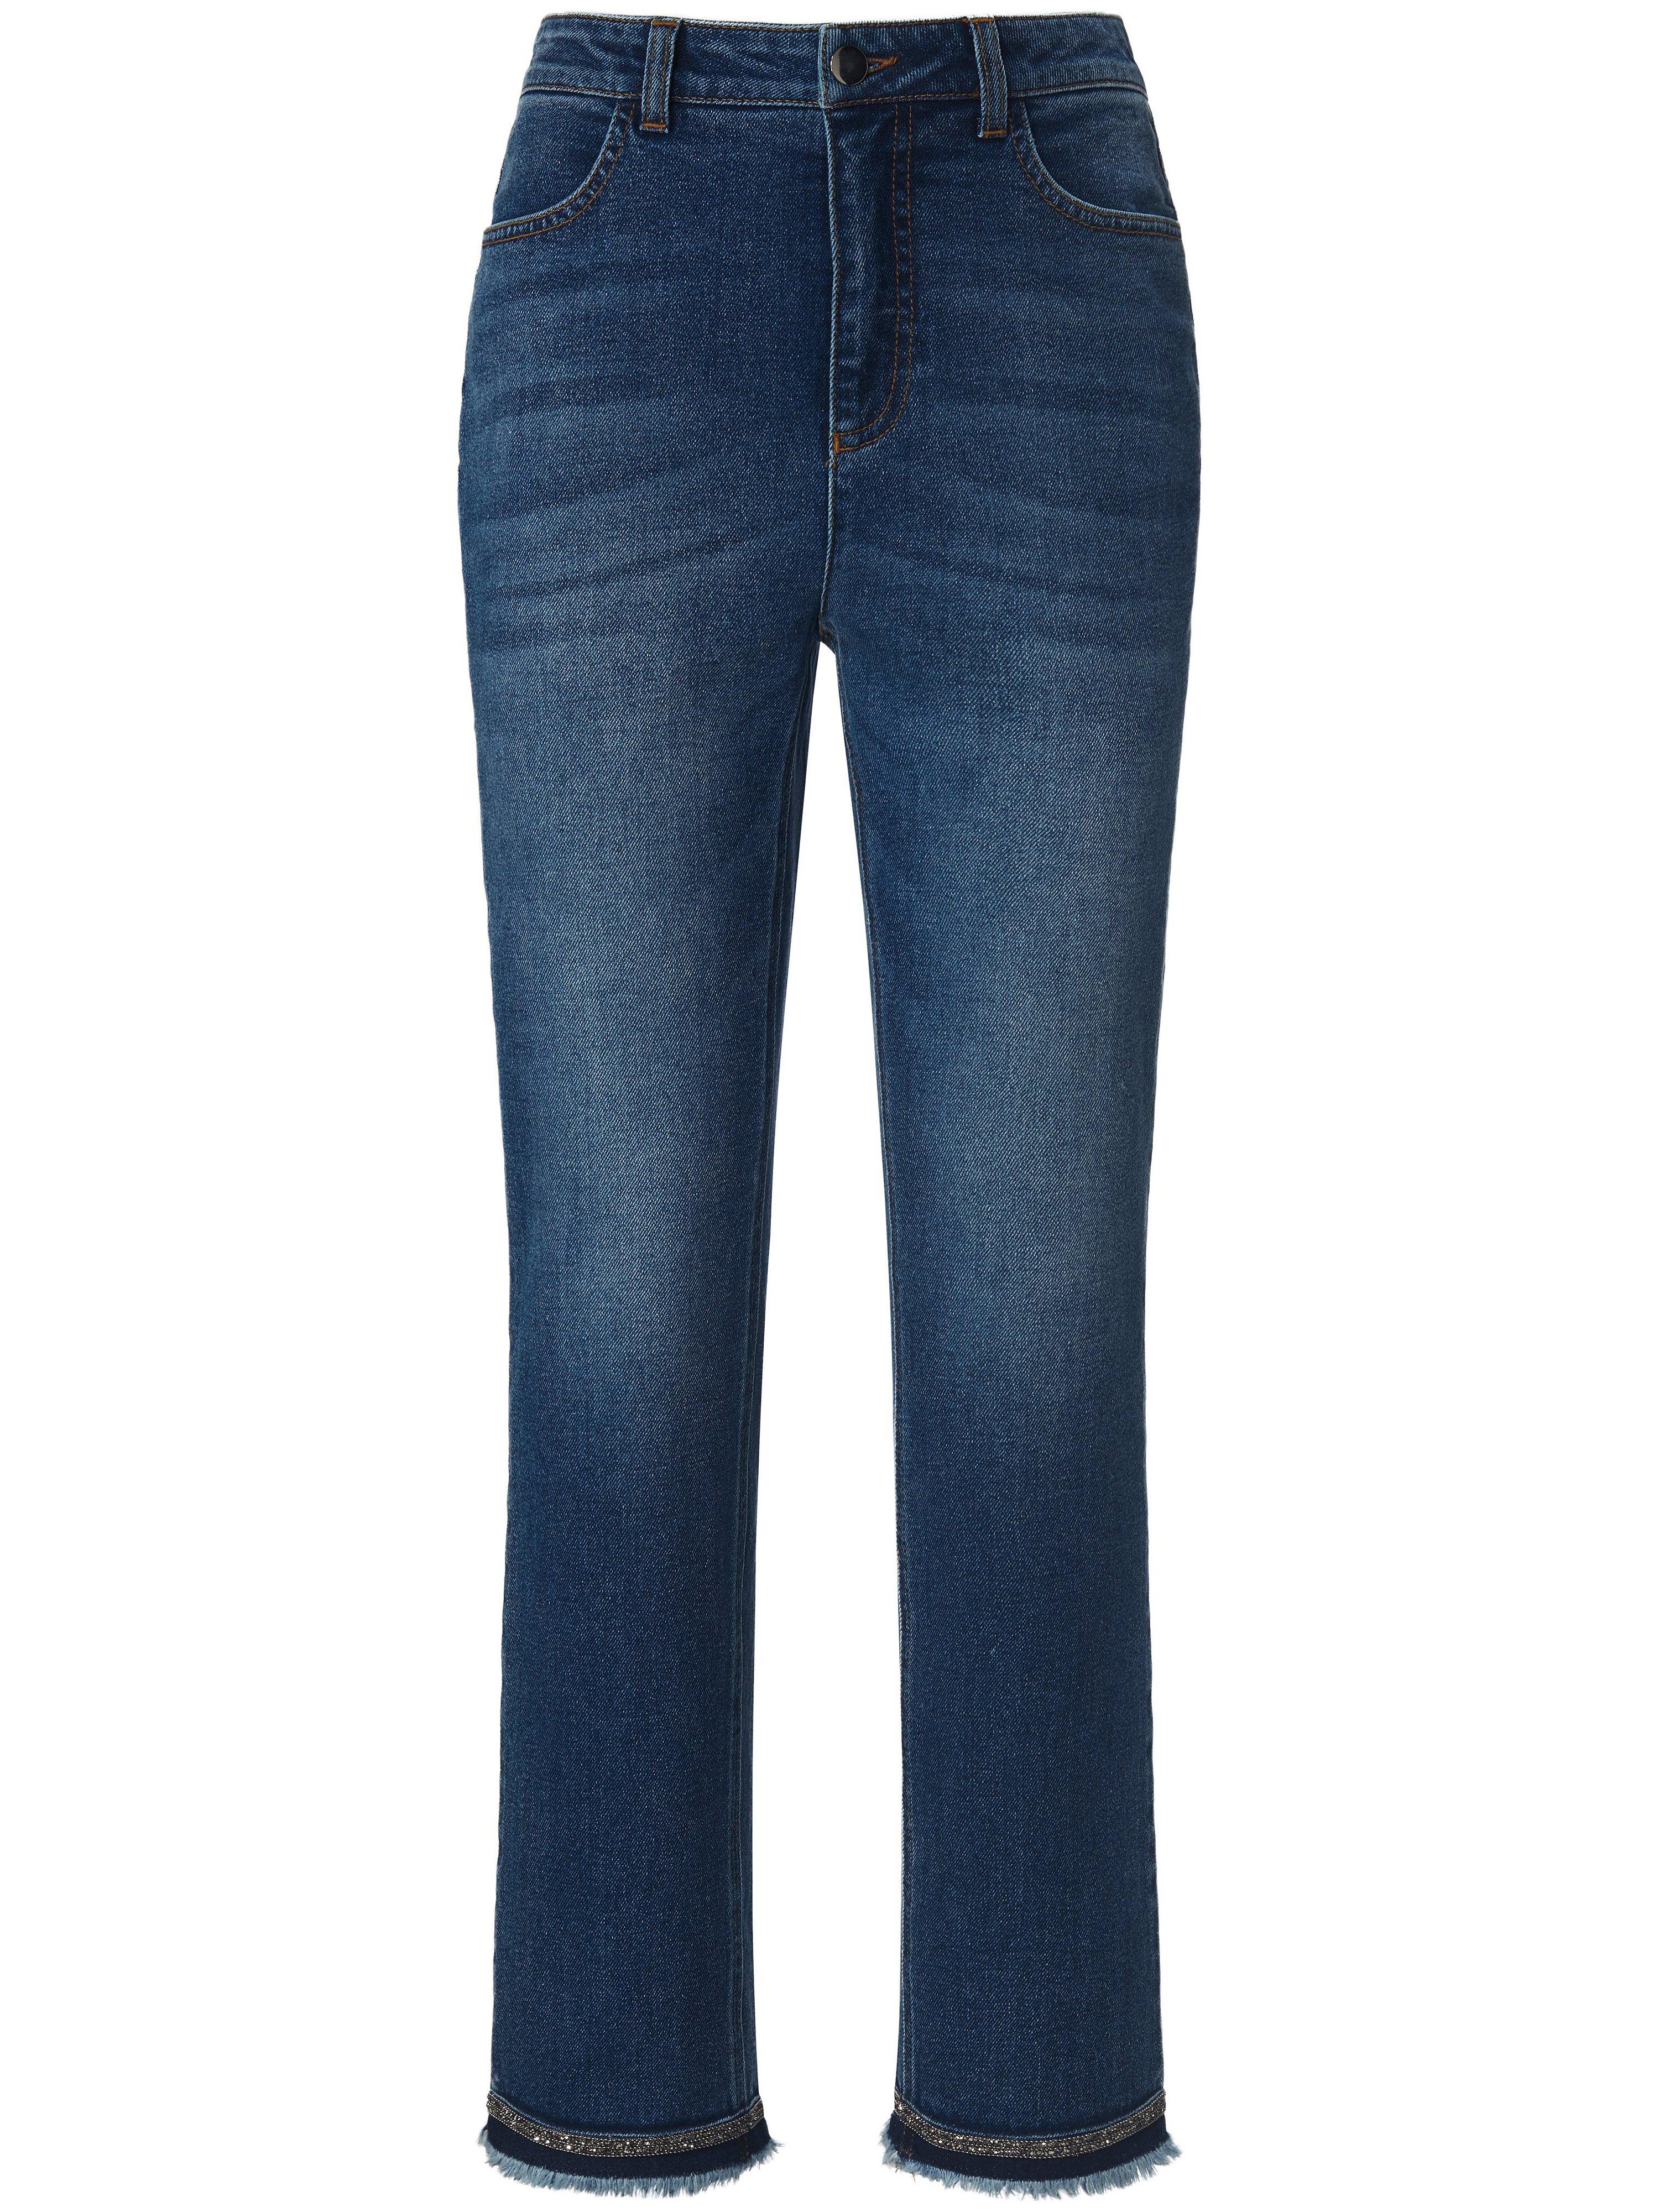 Enkellange jeans pasvorm Barbara Van Peter Hahn denim